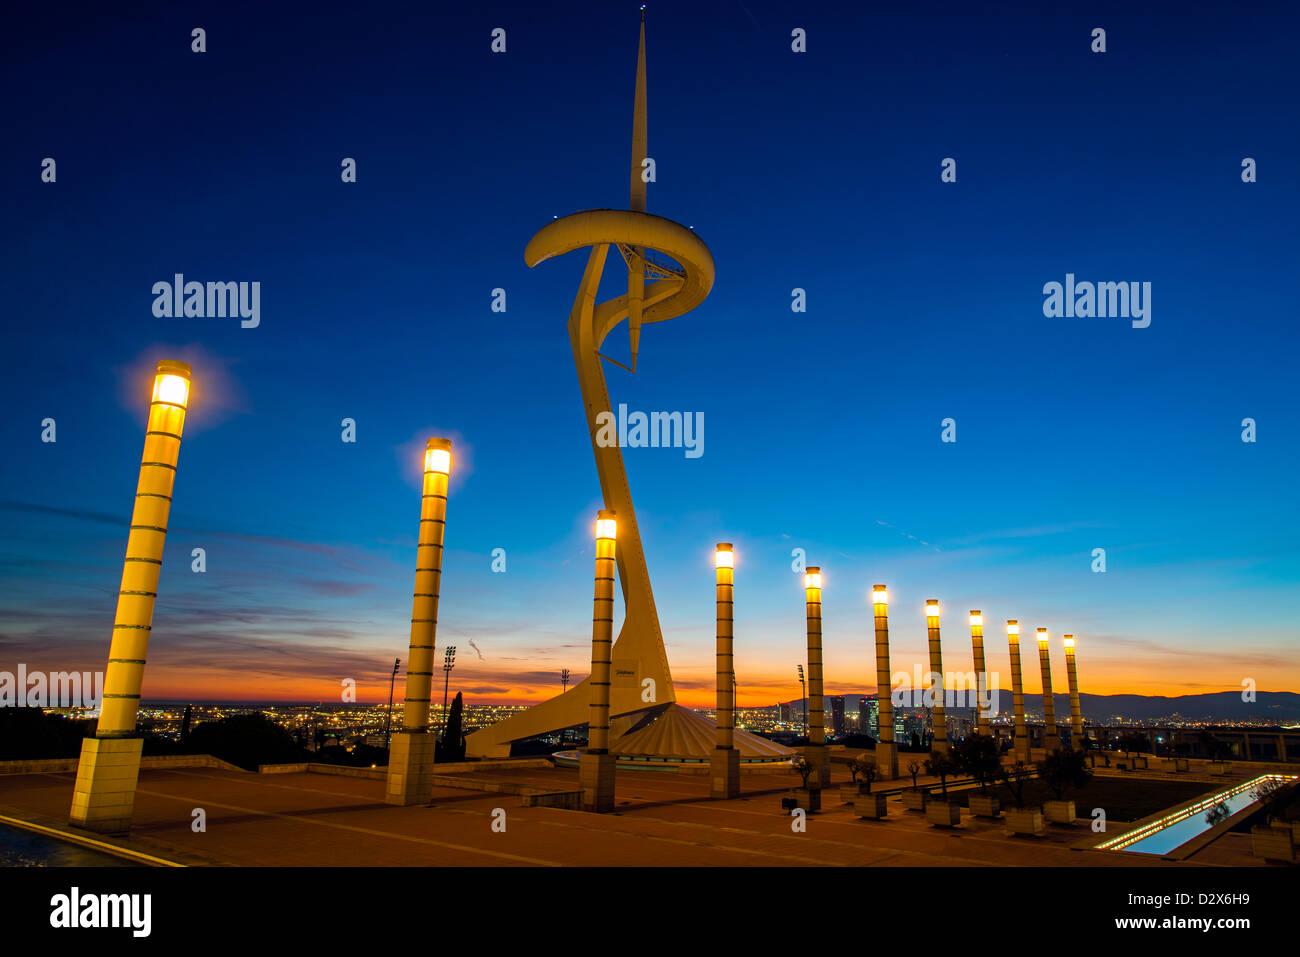 Sunset view of Calatrava Tower, Olympic Park, Barcelona, Catalonia, Spain - Stock Image